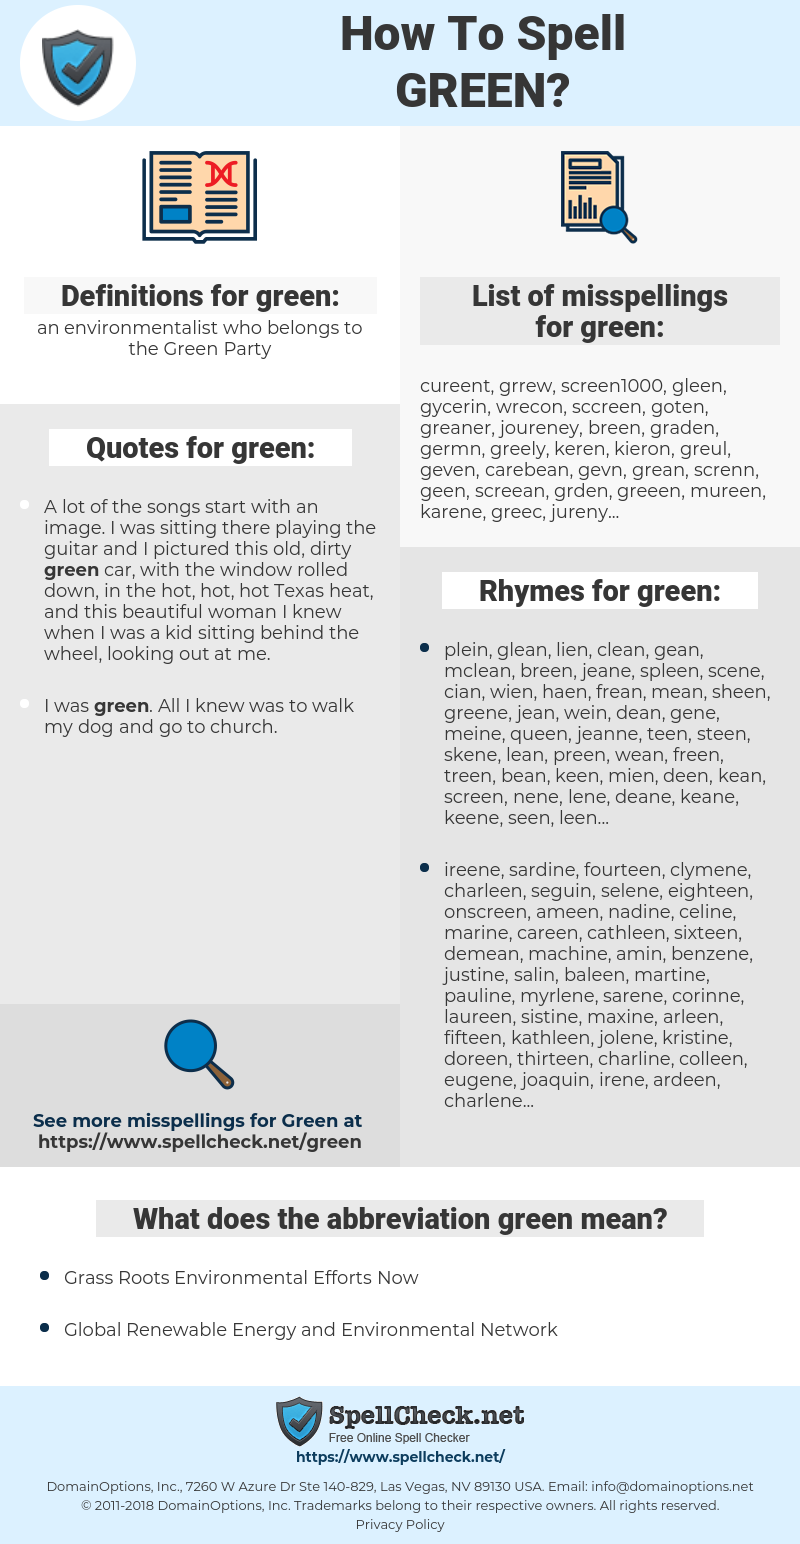 green, spellcheck green, how to spell green, how do you spell green, correct spelling for green